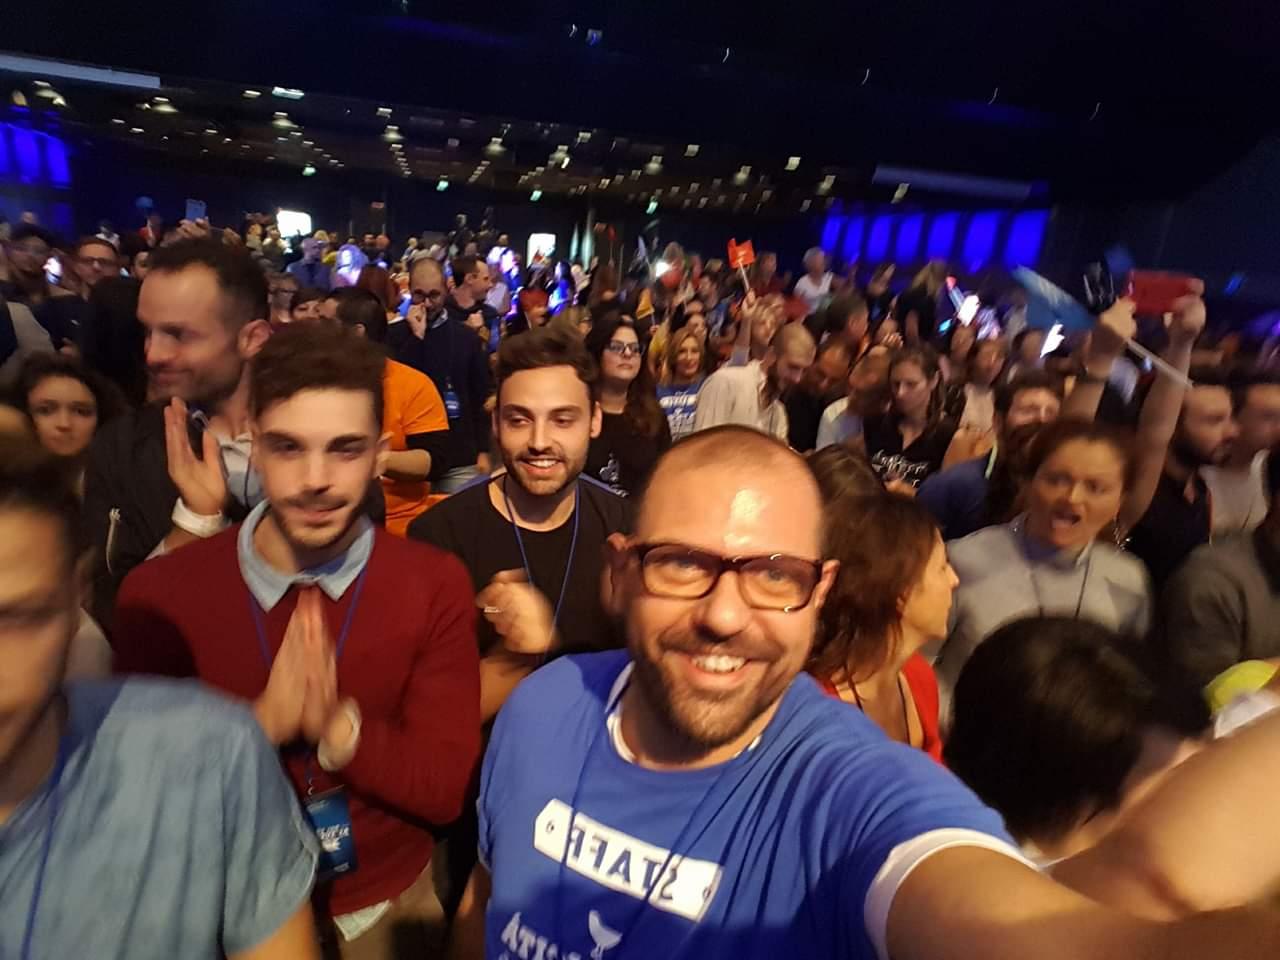 Duolife_2019_corrado_cavarra_networker_sicilia_italia11